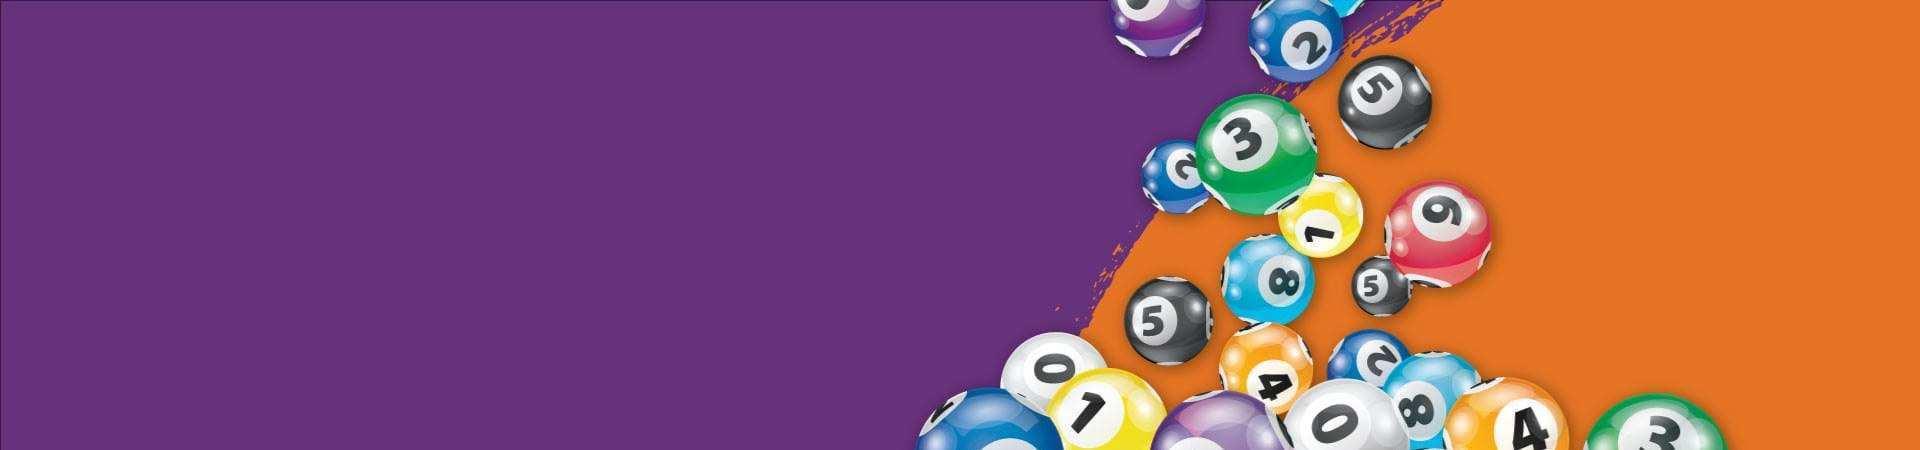 Australia lotto results, jackpots, & fun facts!